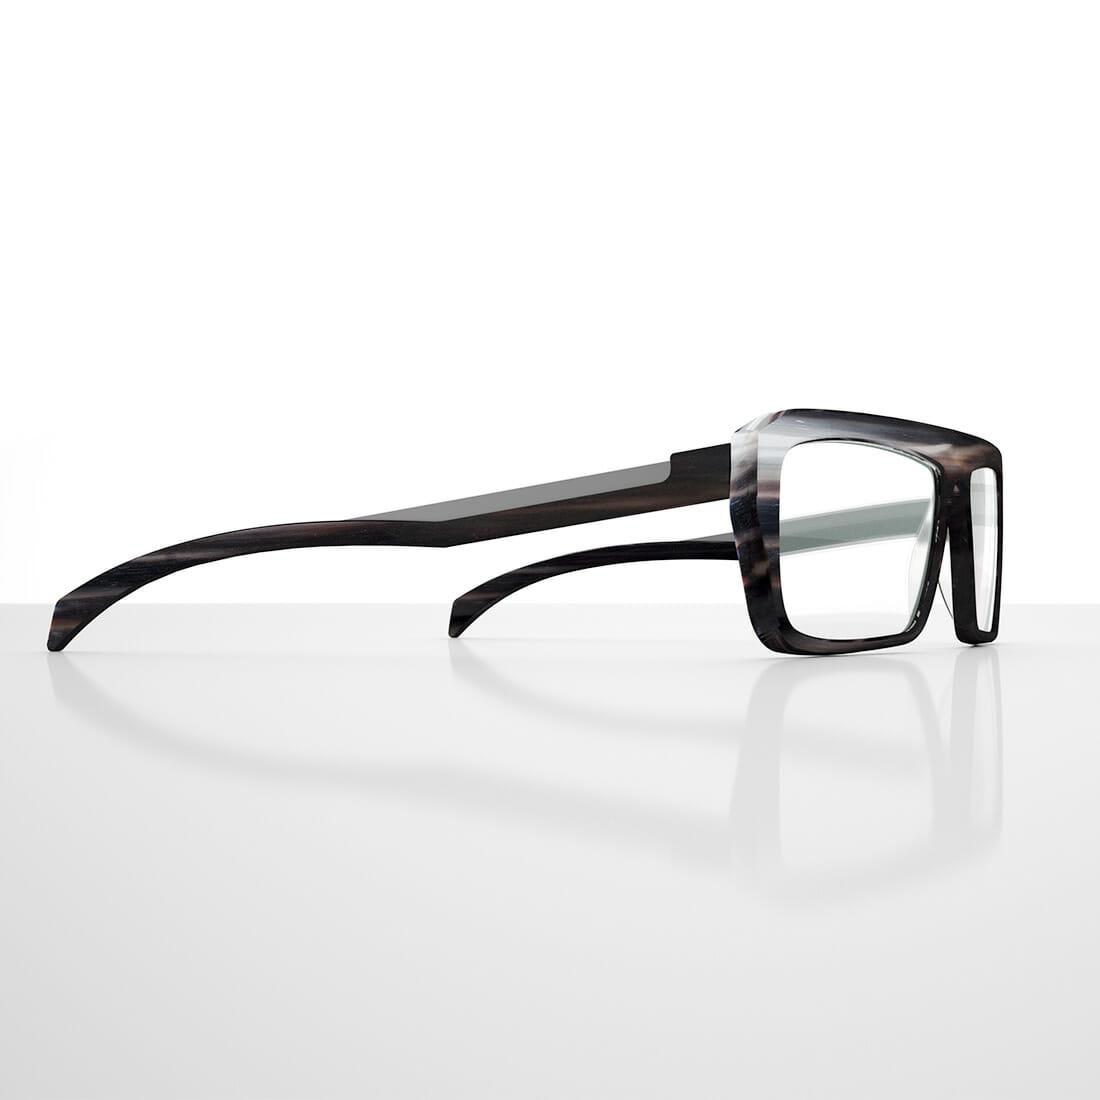 Occhiali eyeglasses HornGain Alberto De Siati